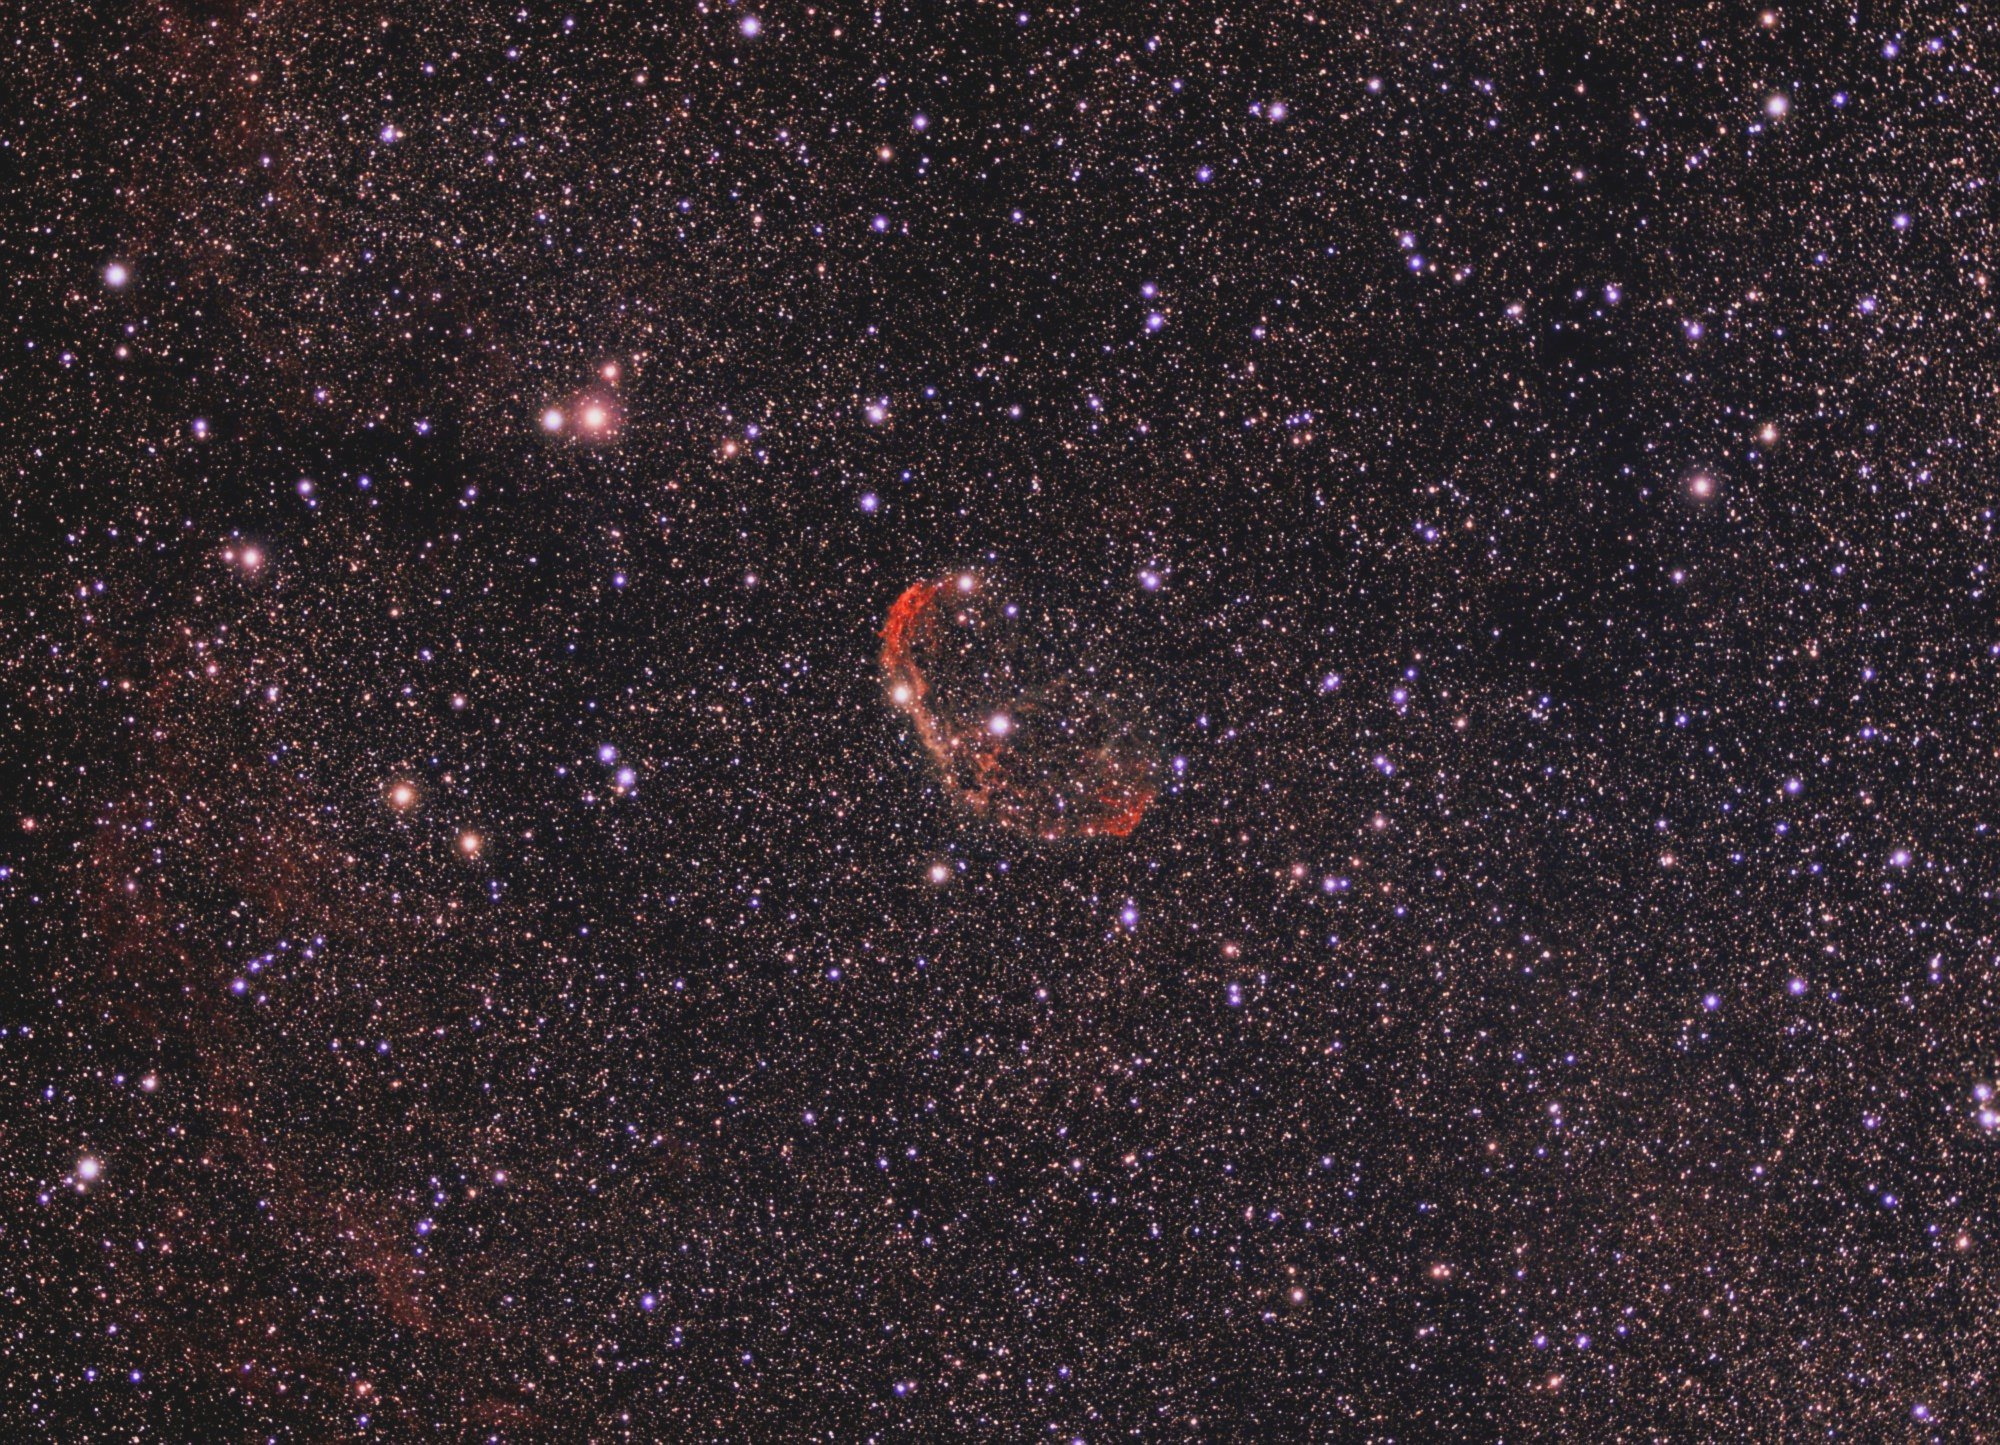 NGC6888.thumb.jpg.0f63265088ad500c92624f916d8d8ec9_2.jpg.7b34ee2448dd710be5cee40dbce287ab.jpg